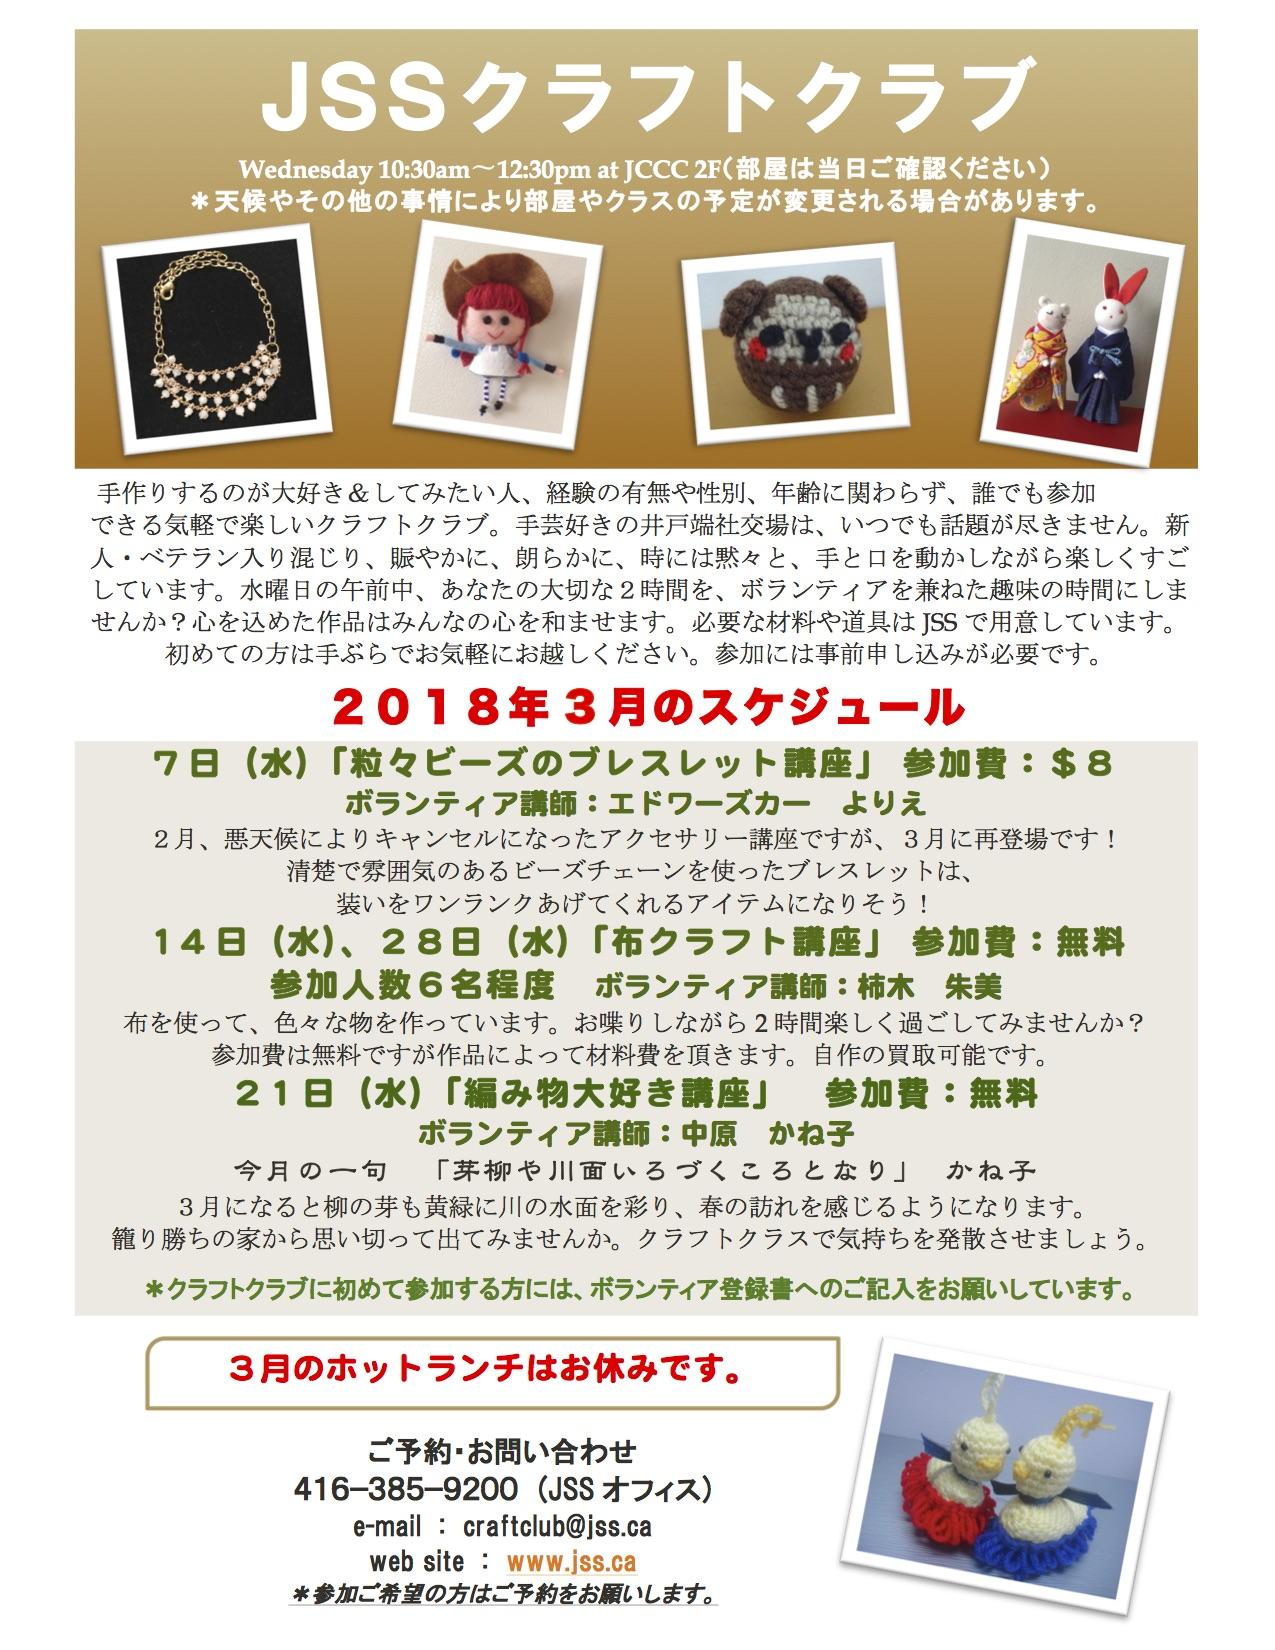 [:ja]JSS クラフトクラブ 3月の予定[:en]JSS Craft Club Schedule - March[:]